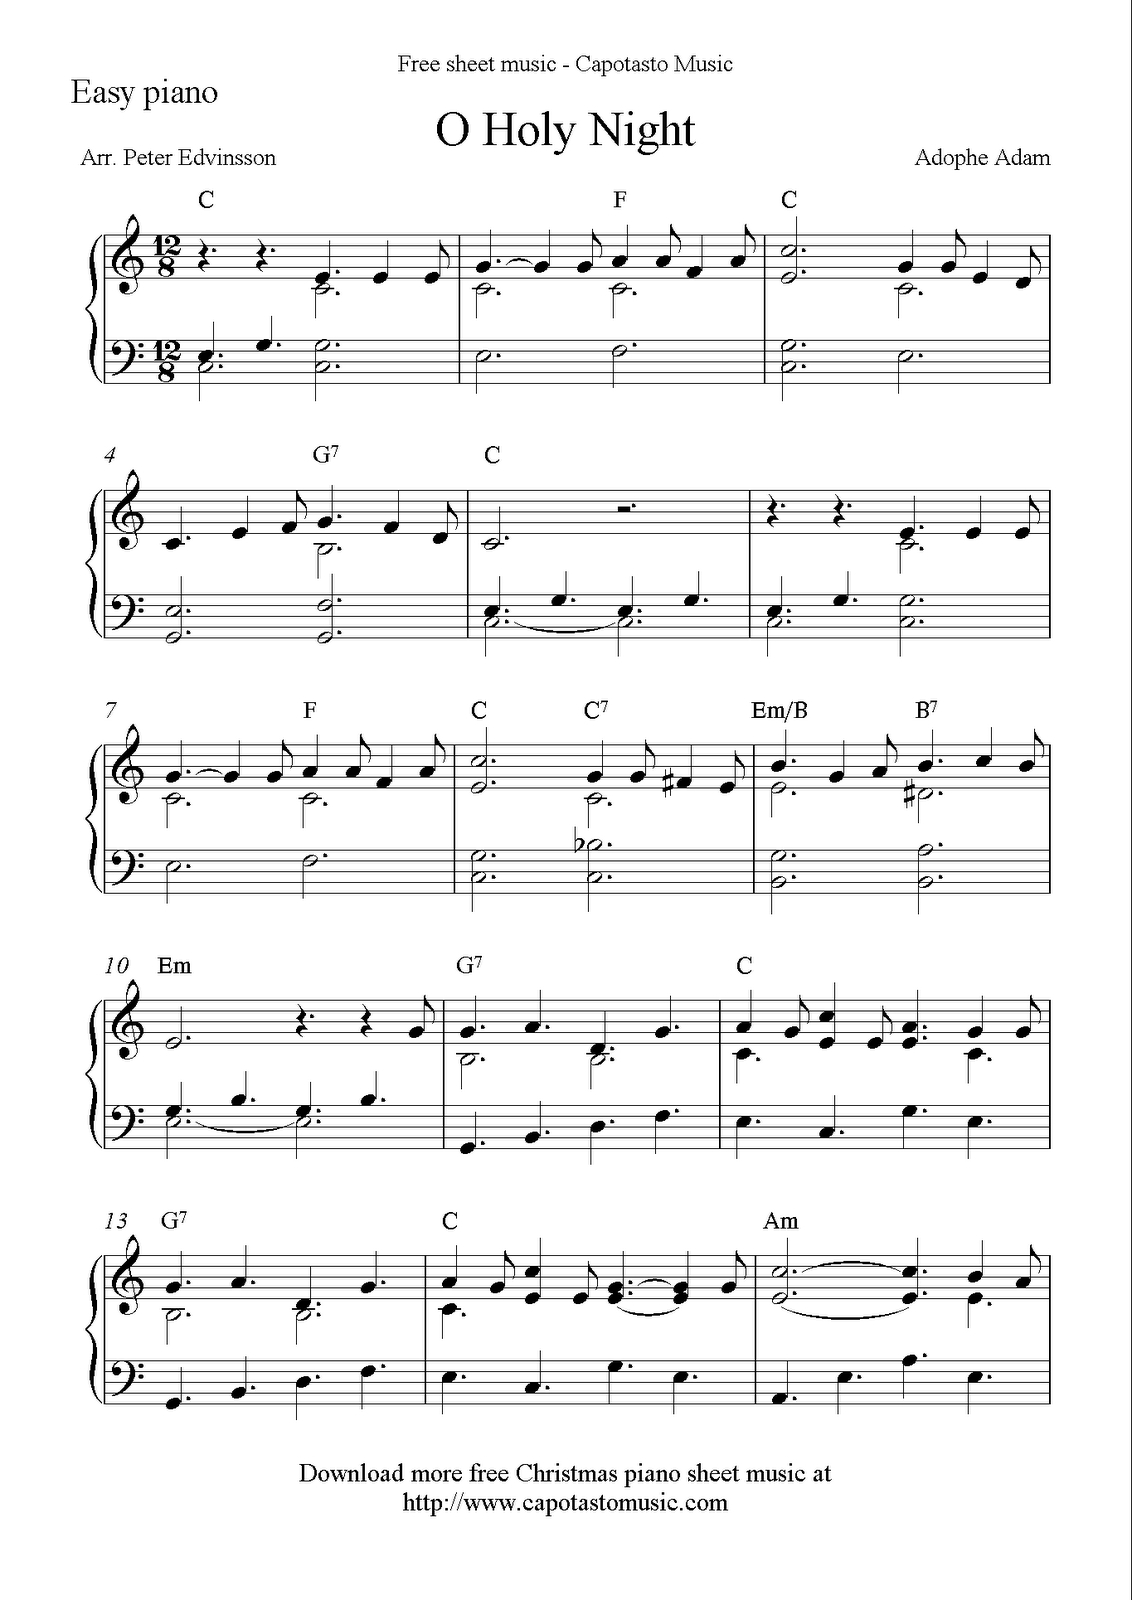 Free Sheet Music Scores: Free Easy Christmas Piano Sheet Music, O - Free Christmas Sheet Music For Keyboard Printable